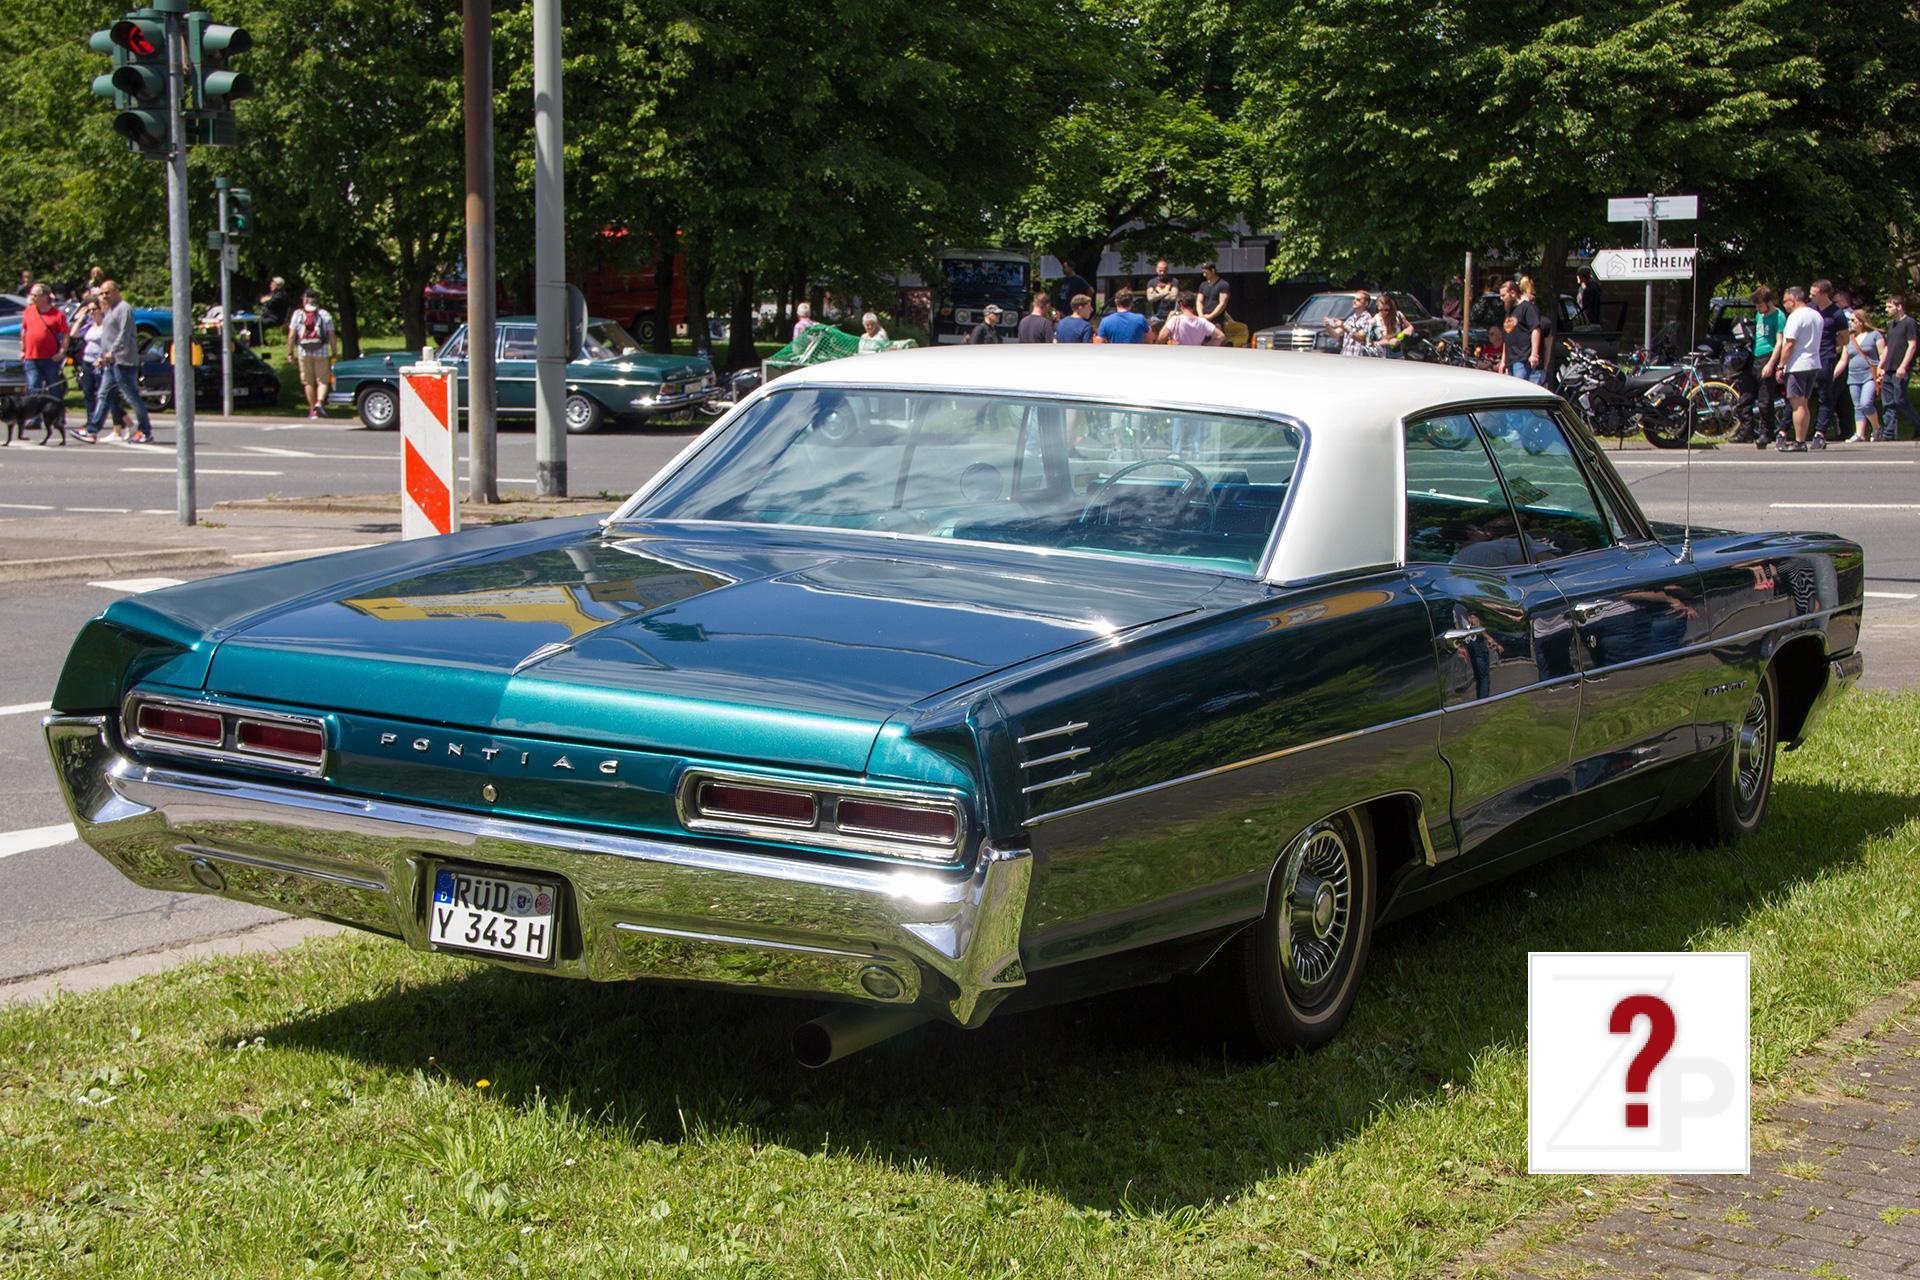 1966 Pontiac Star Chief Executive Sedan Rear View